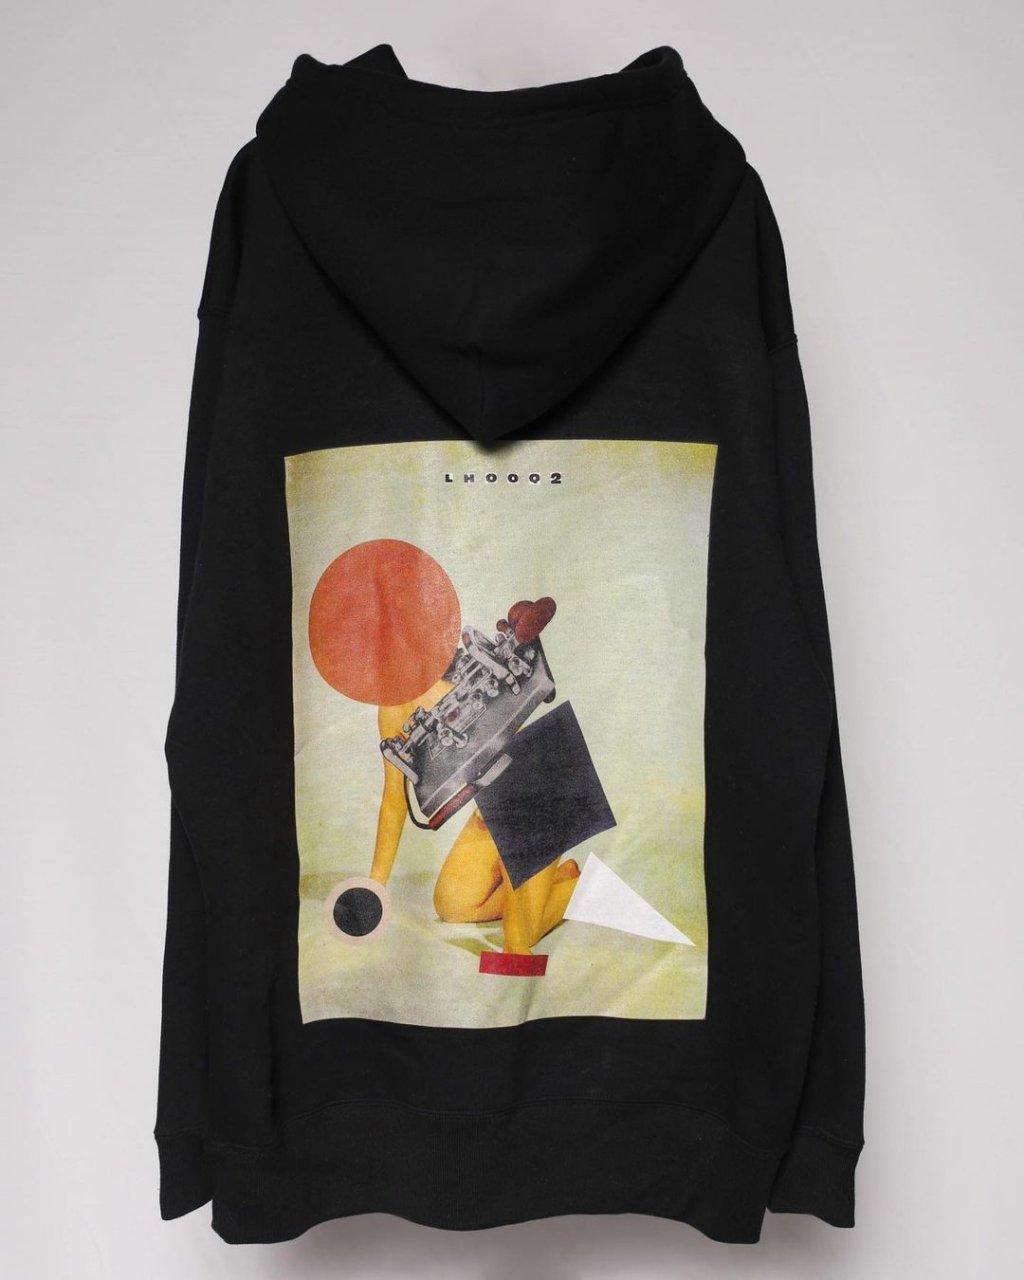 Hoodie(collage by Q-TA)(Black)